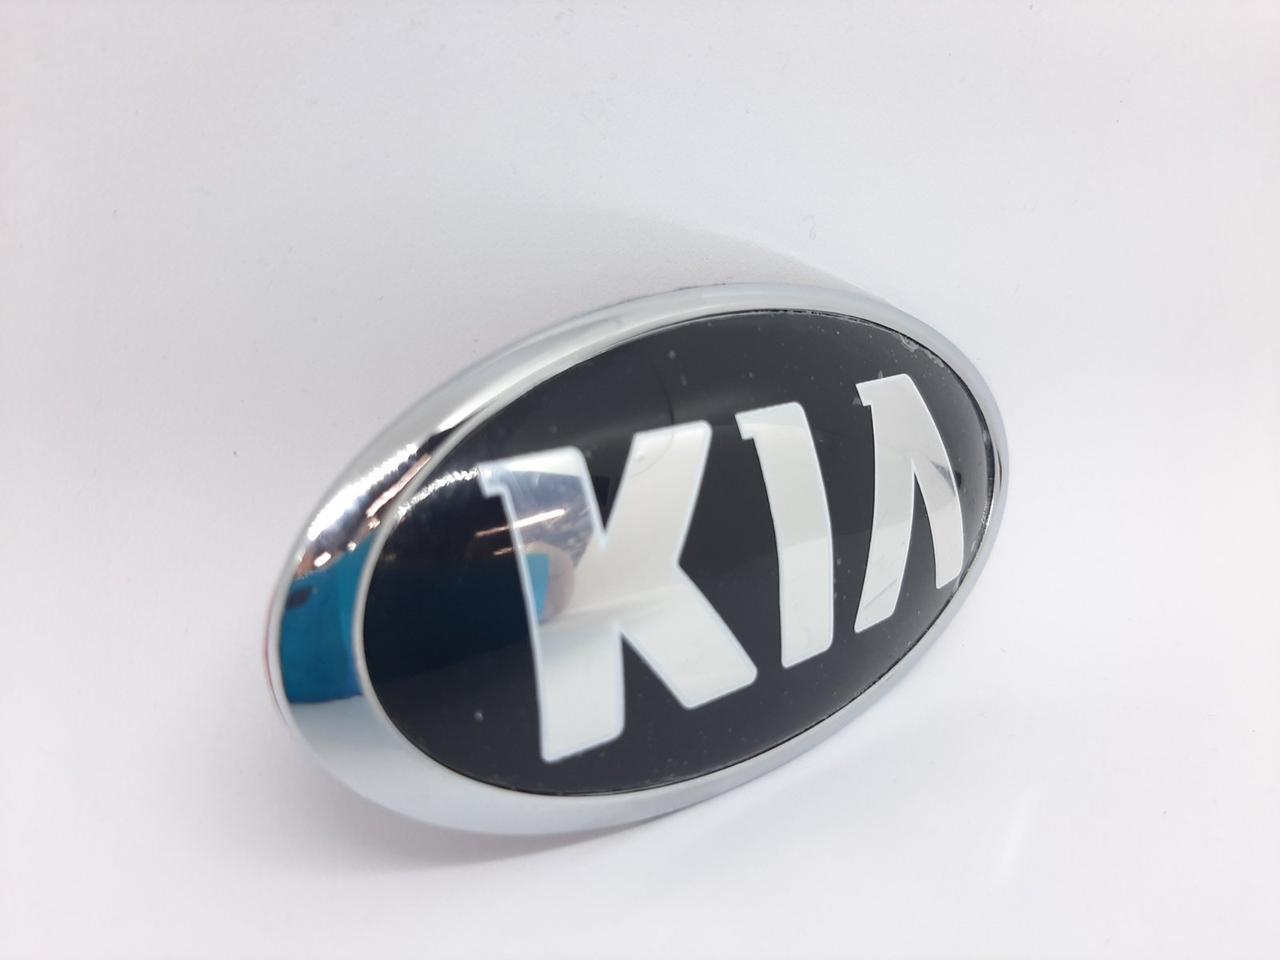 Эмблема логотип значок Kia на капот и крышку багажника 150 мм